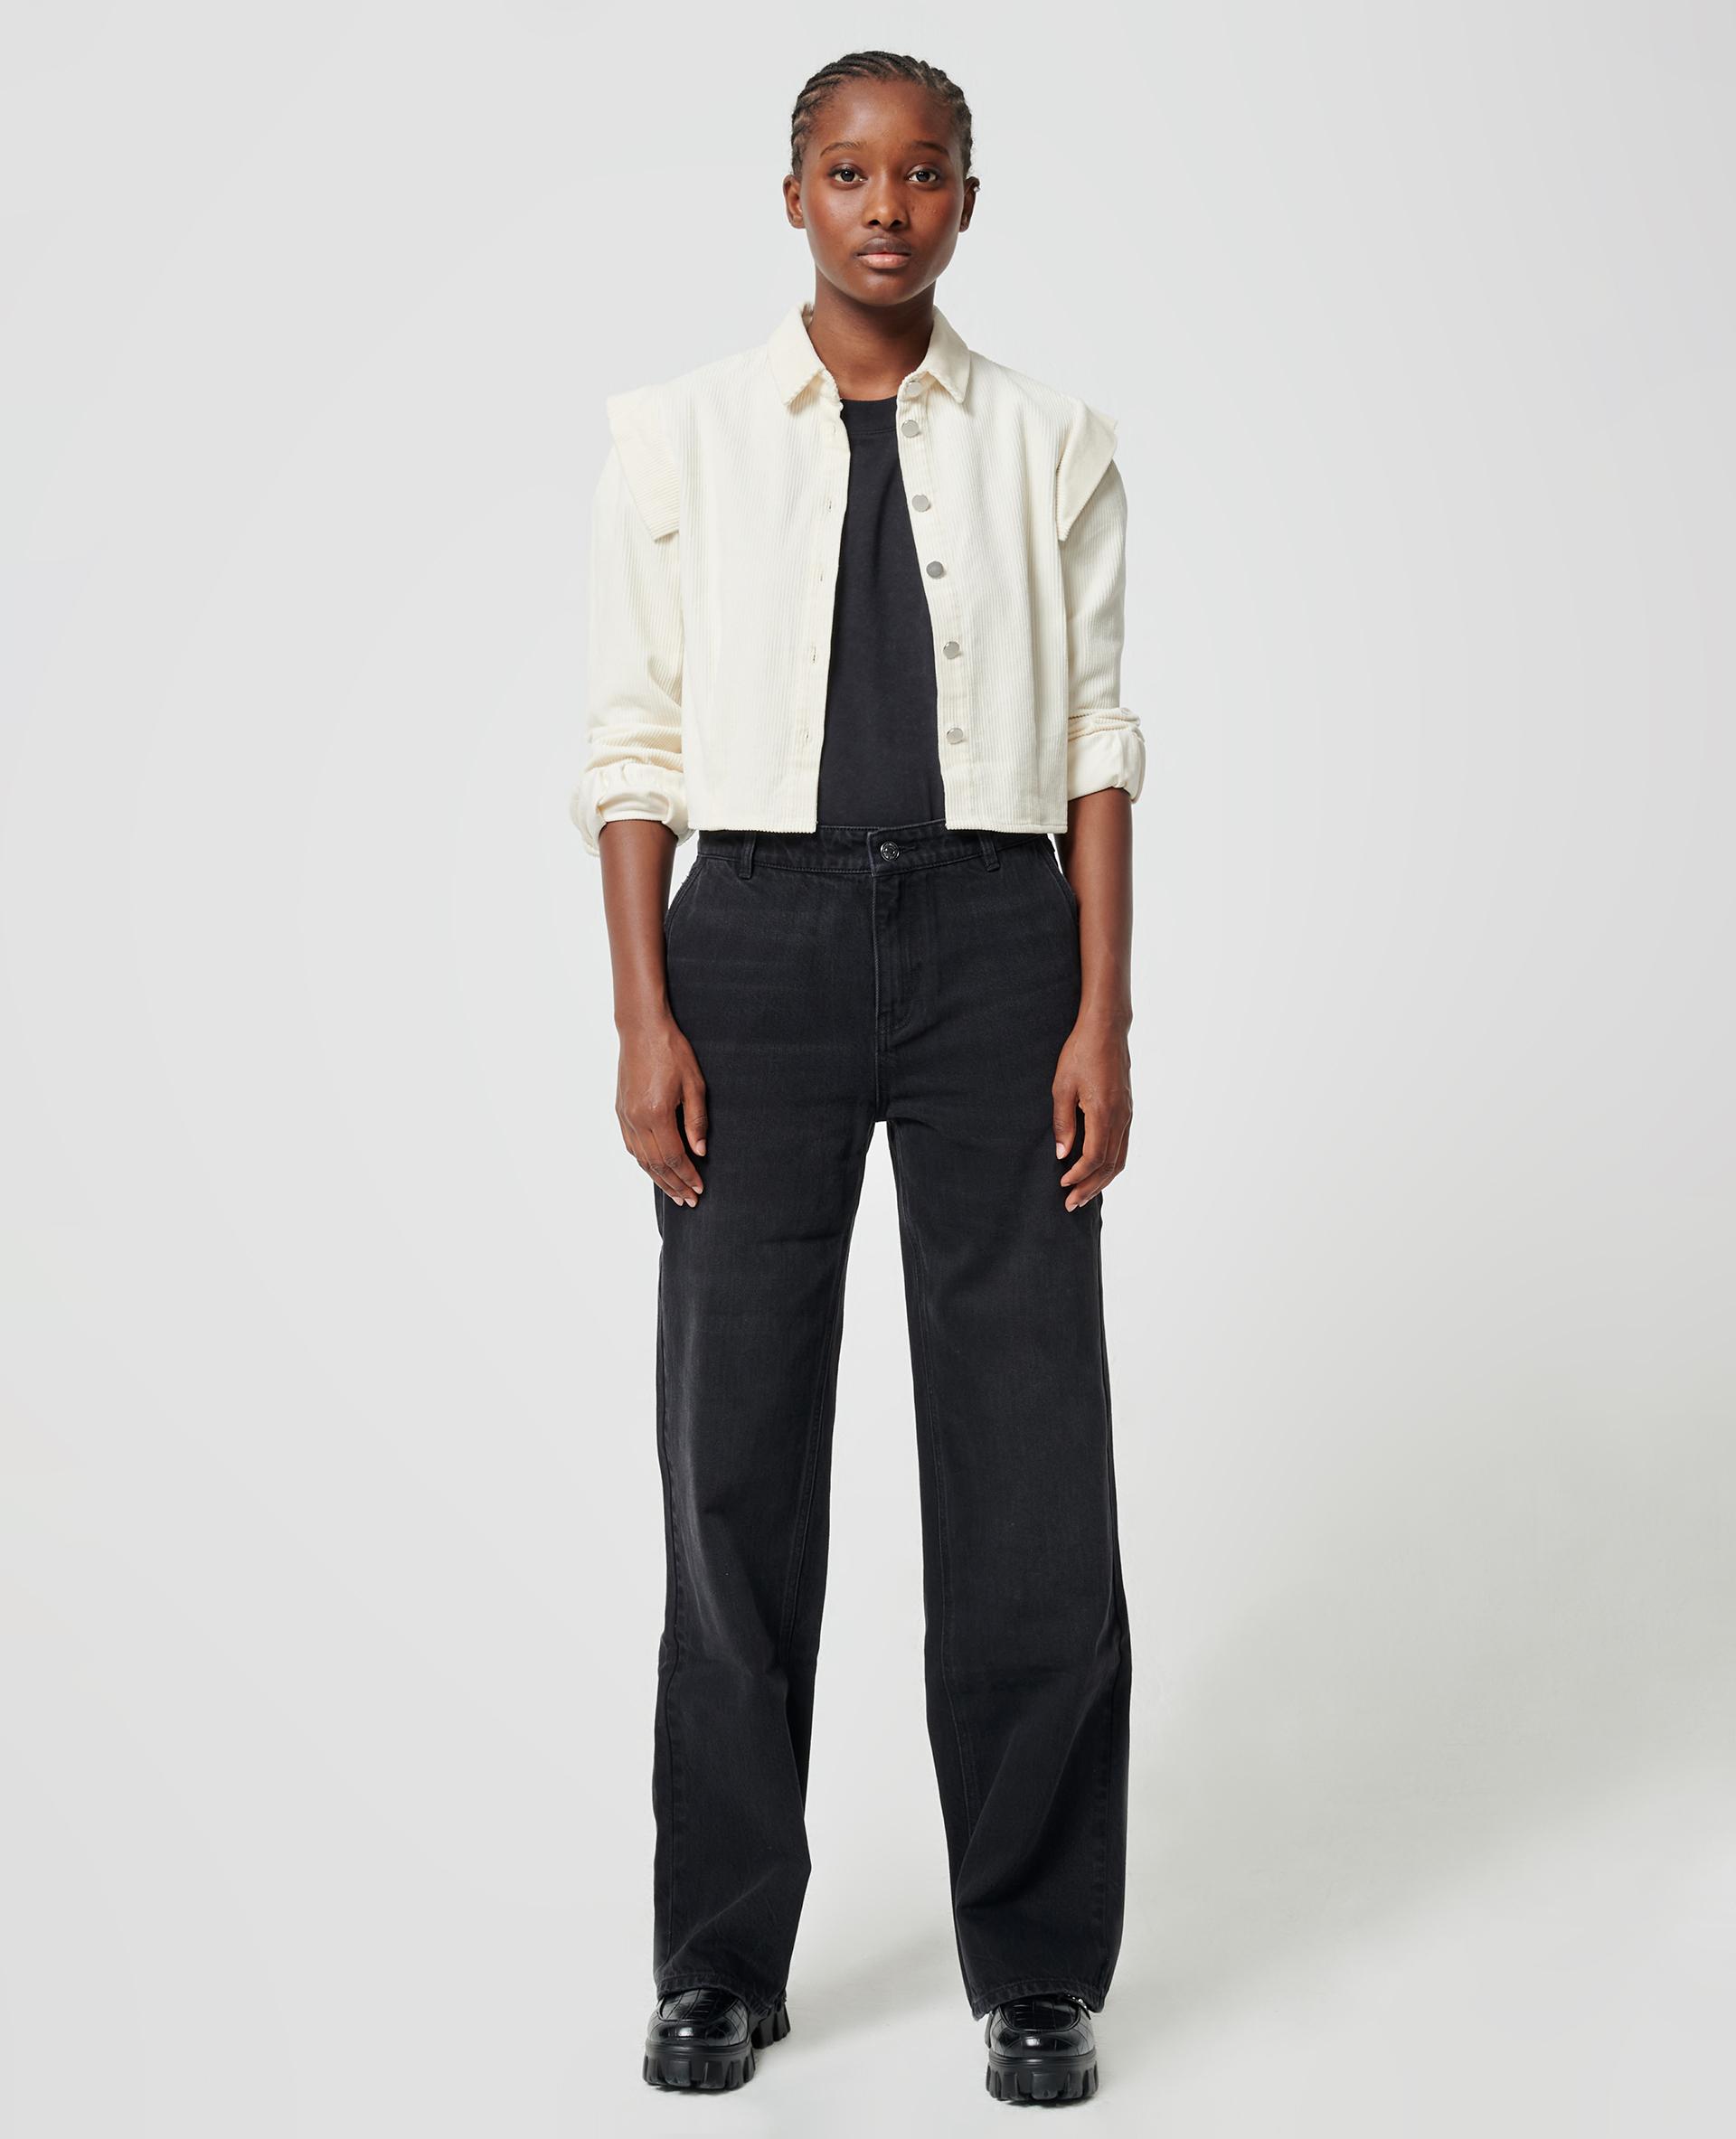 Brede jeans zwart - Pimkie